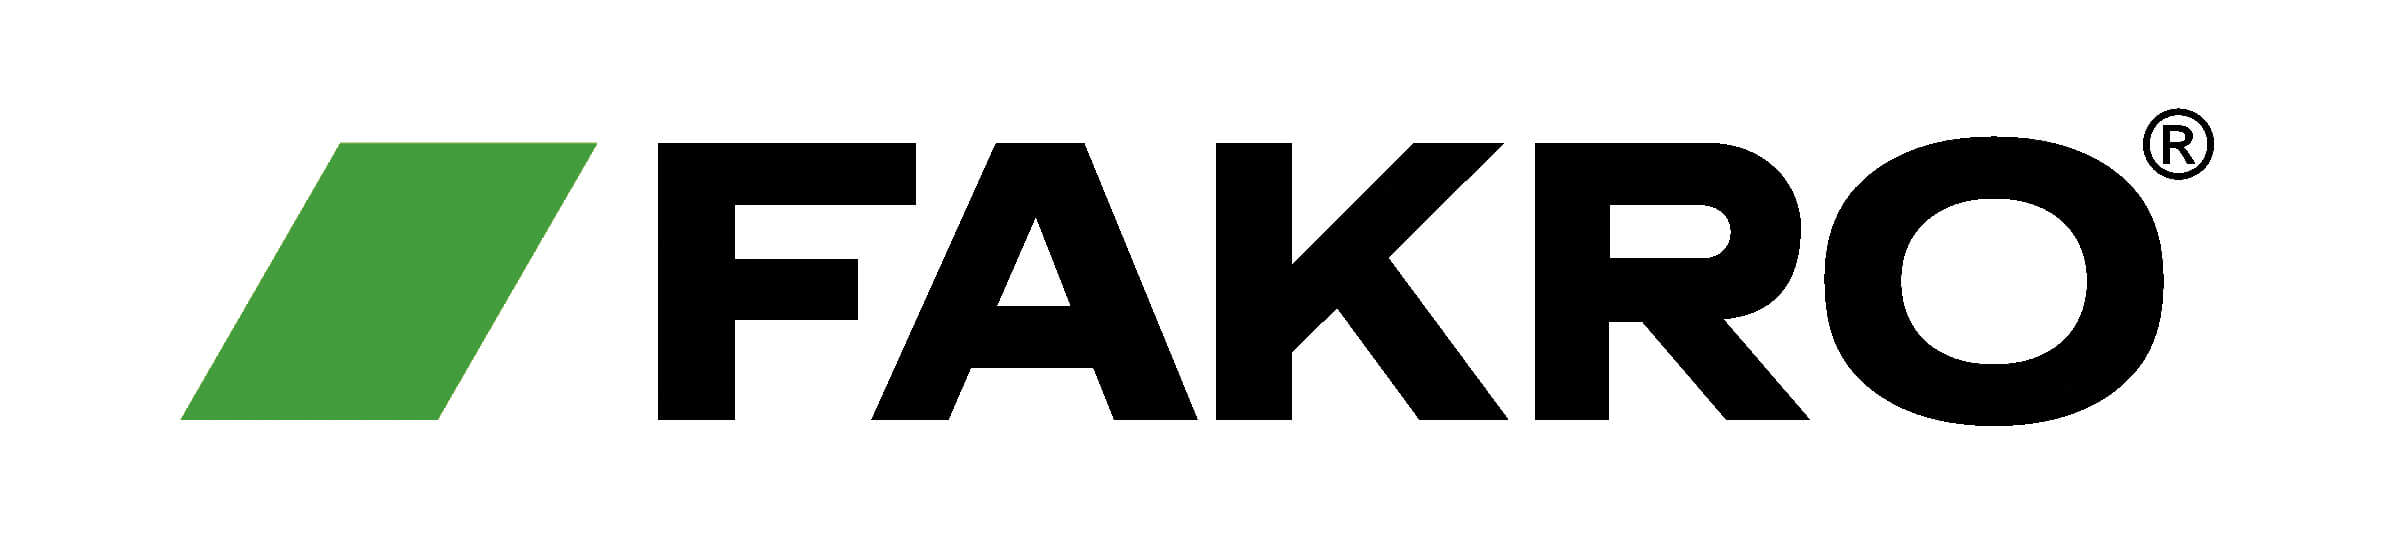 413974 logo rgb1 2